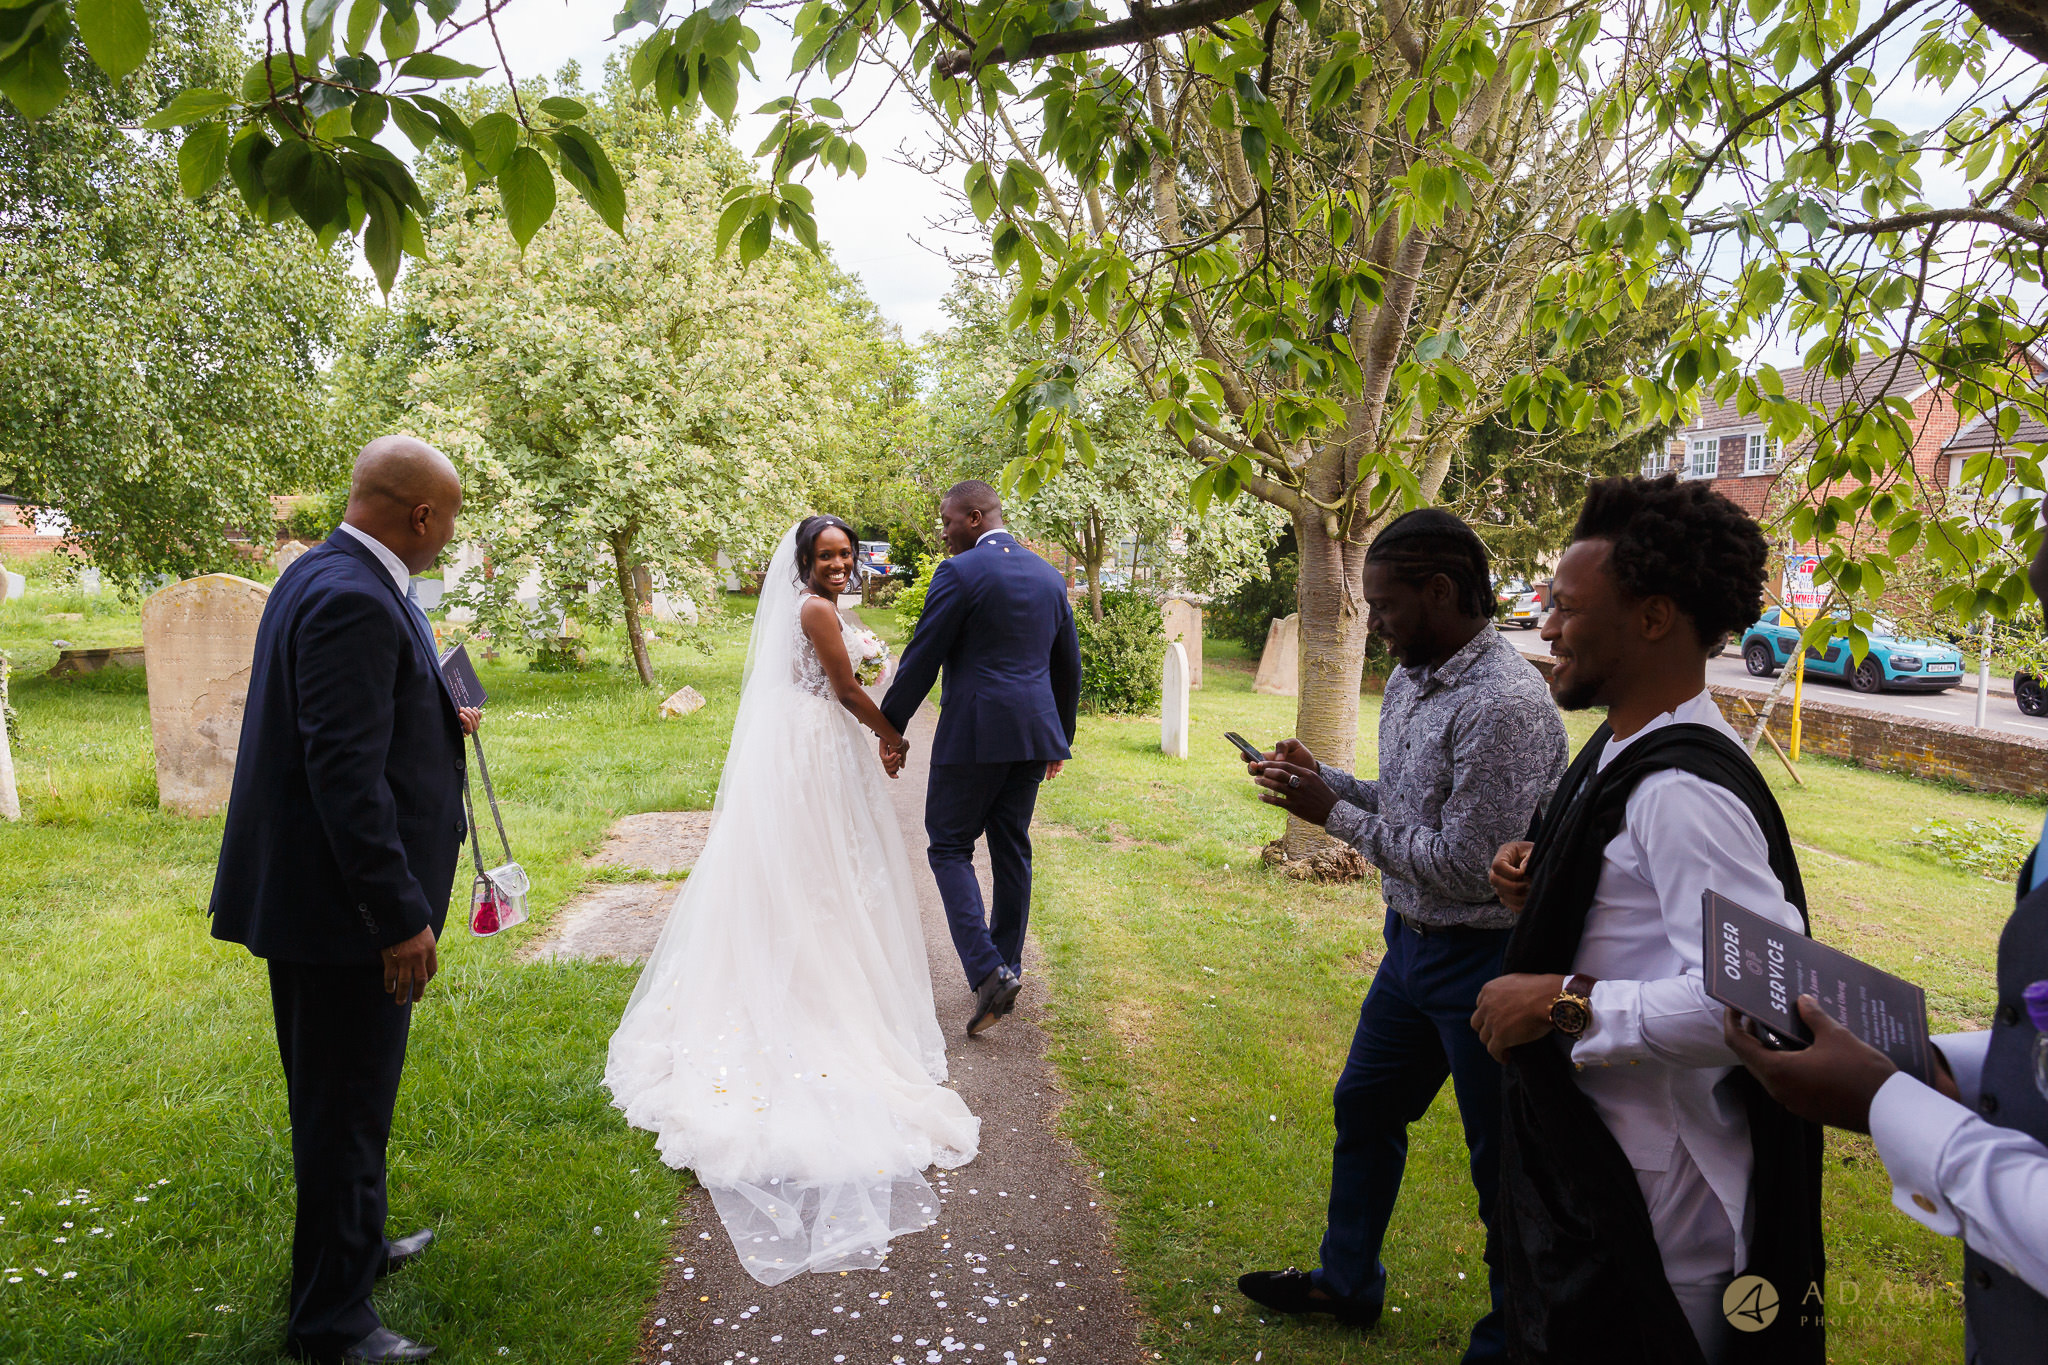 bride and groom walk away